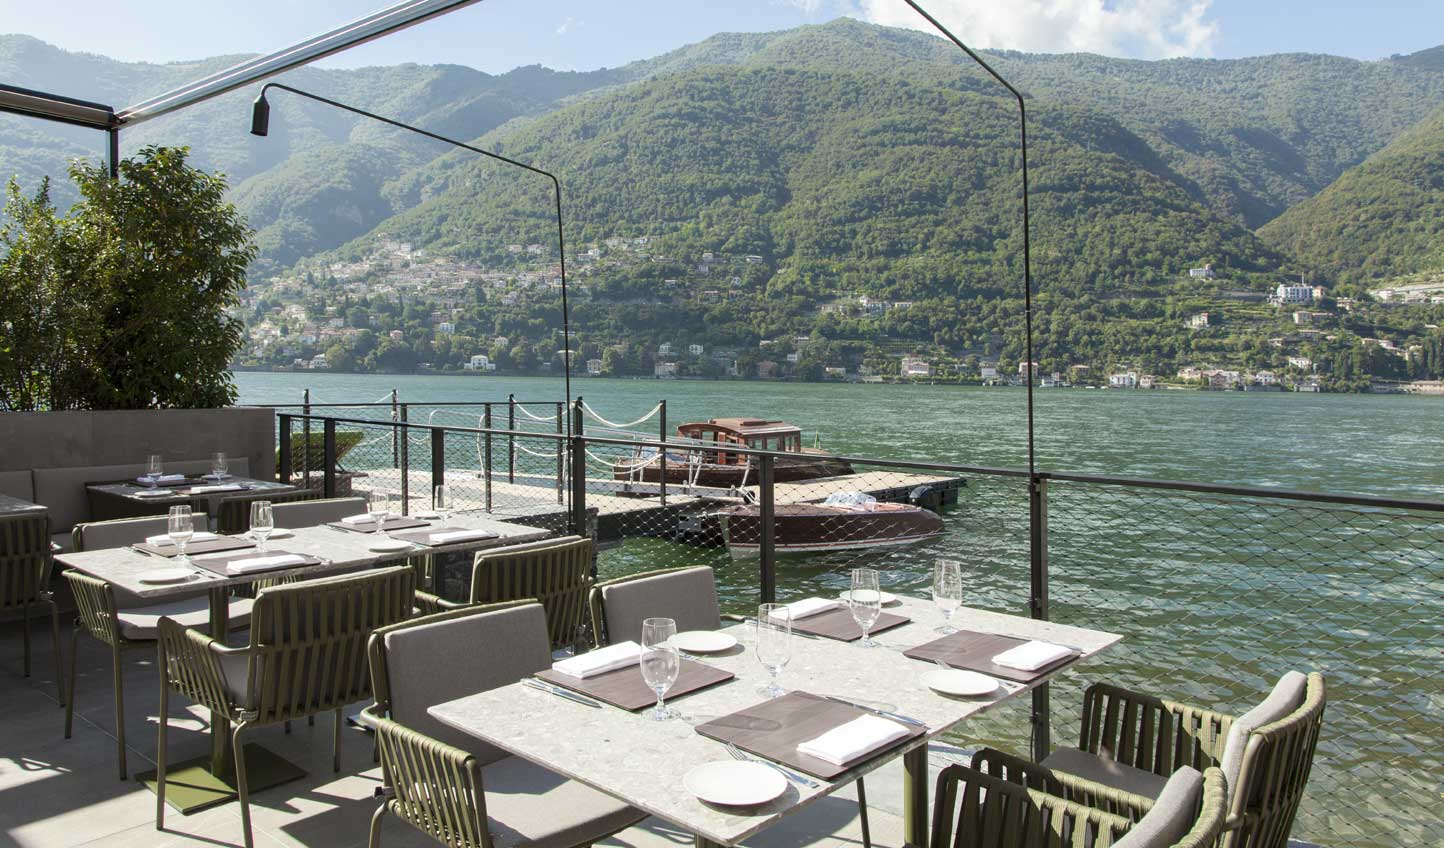 Dine under the Italian sun